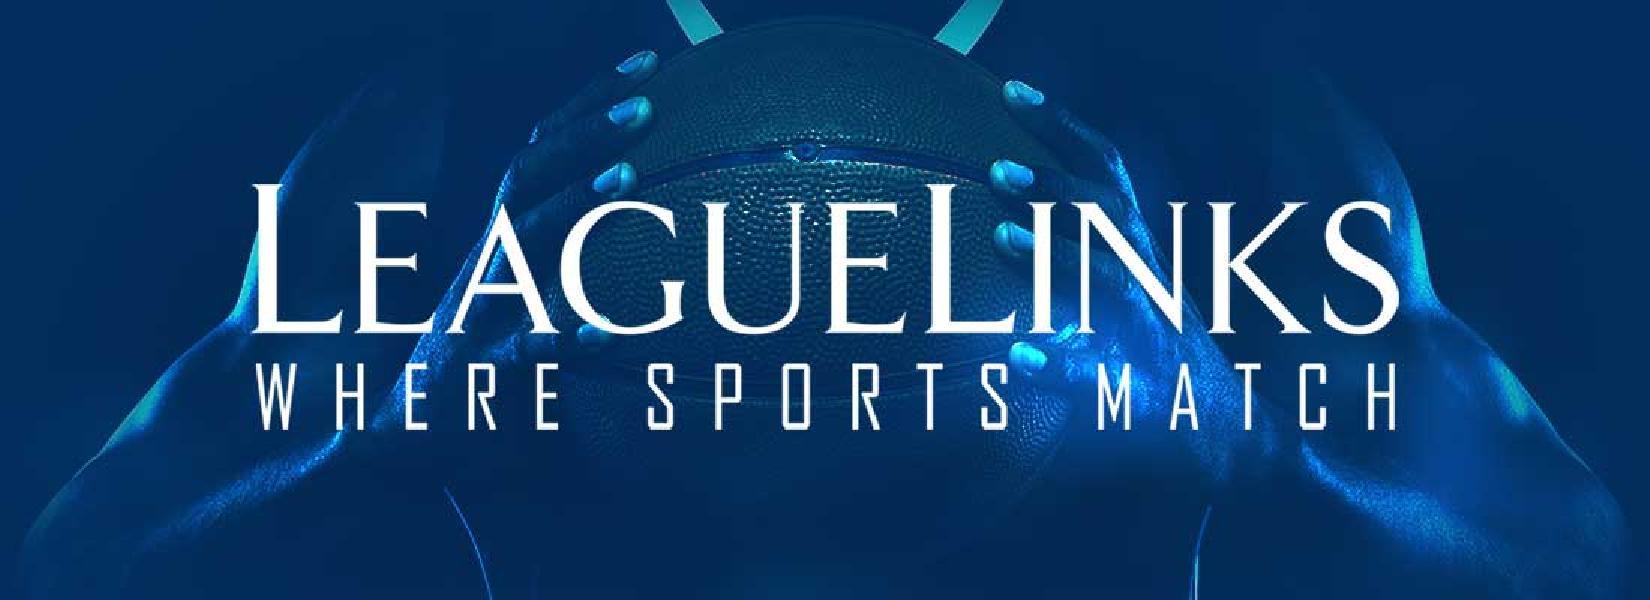 https://www.basketmarche.it/immagini_articoli/24-05-2021/nasce-leaguelinks-community-dedicata-mondo-basket-corri-iscriverti-600.jpg